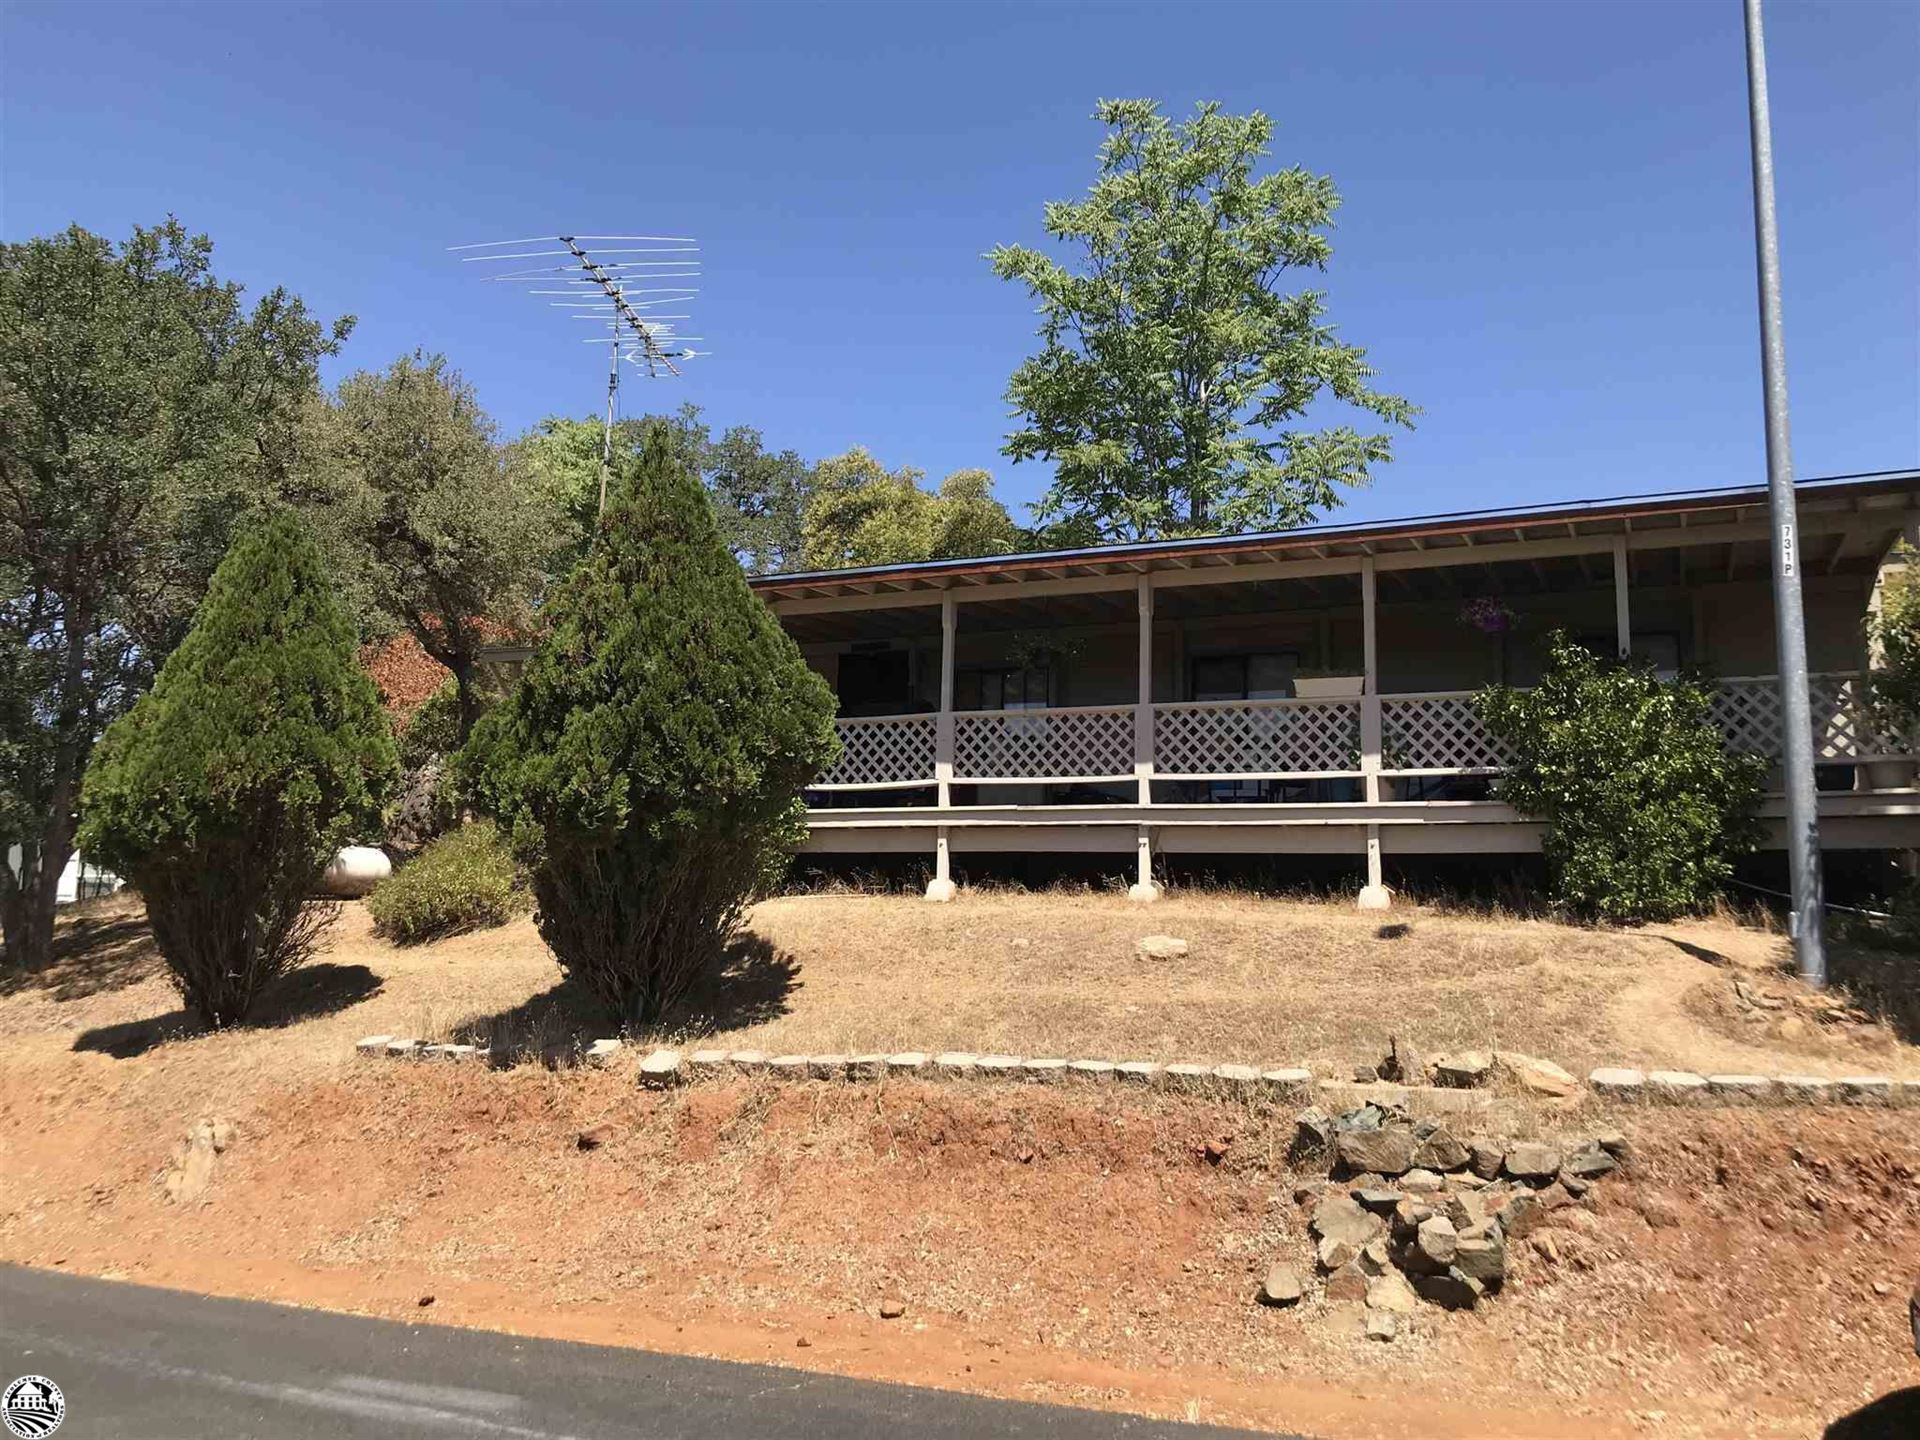 8400 Old Melones Dam R #77 Road Road, Jamestown, CA 95327 - MLS#: 20201216